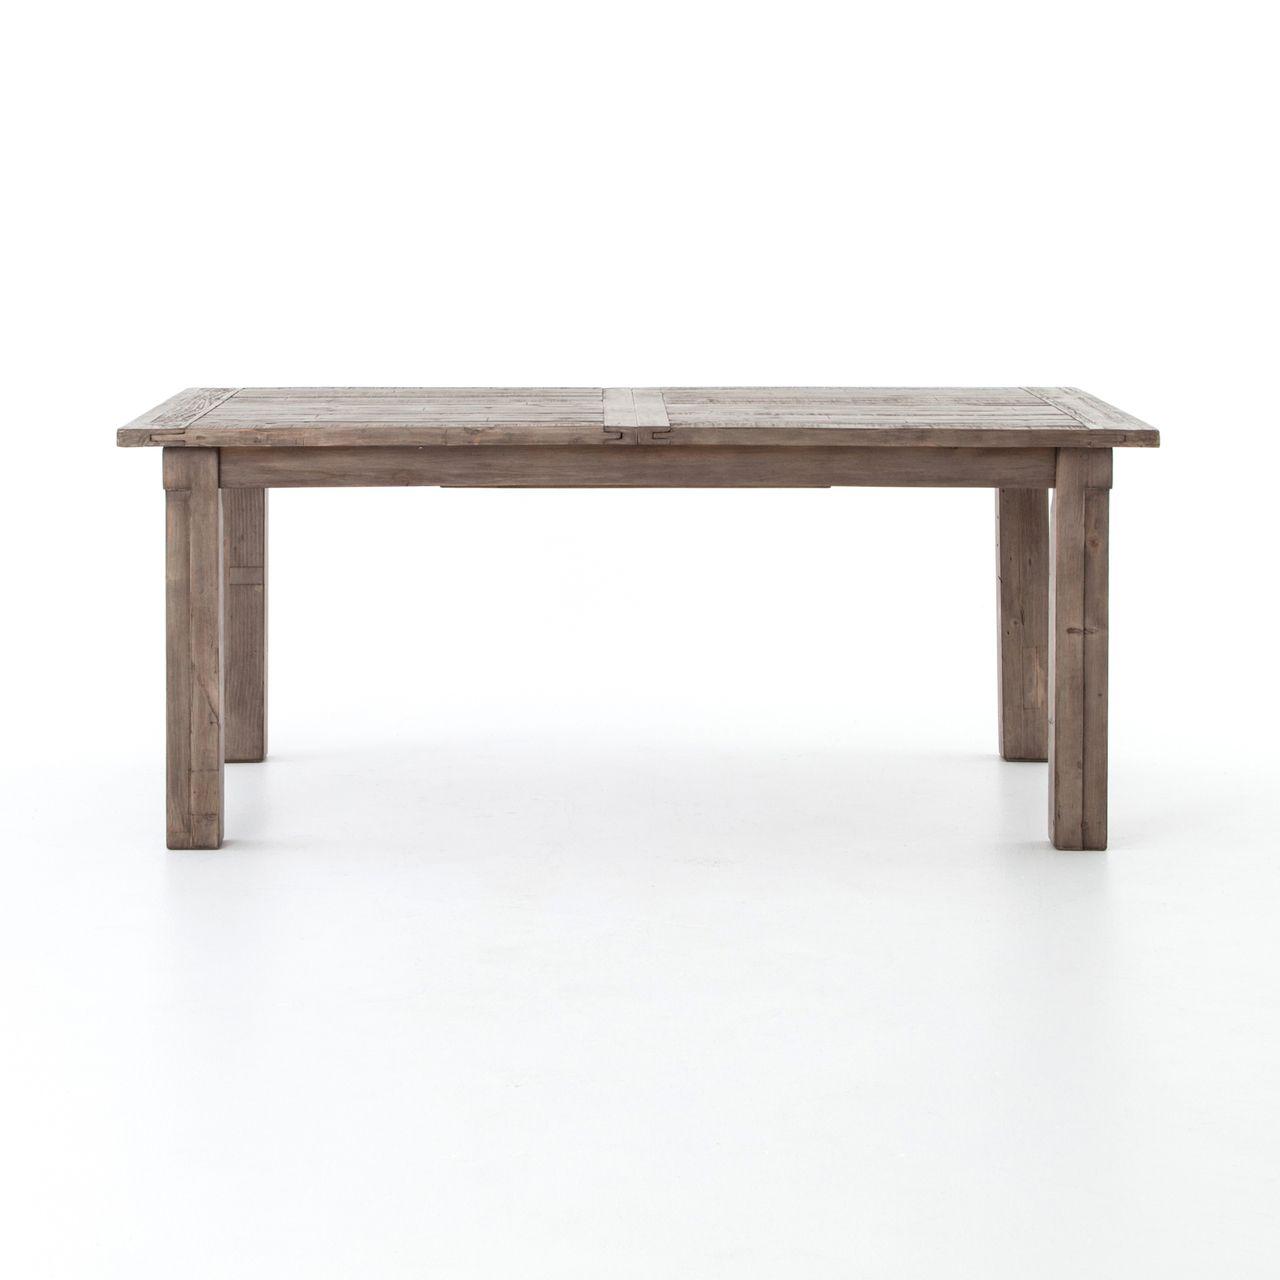 cintra grey reclaimed wood extending dining table 72 96 in 2019 rh pinterest com